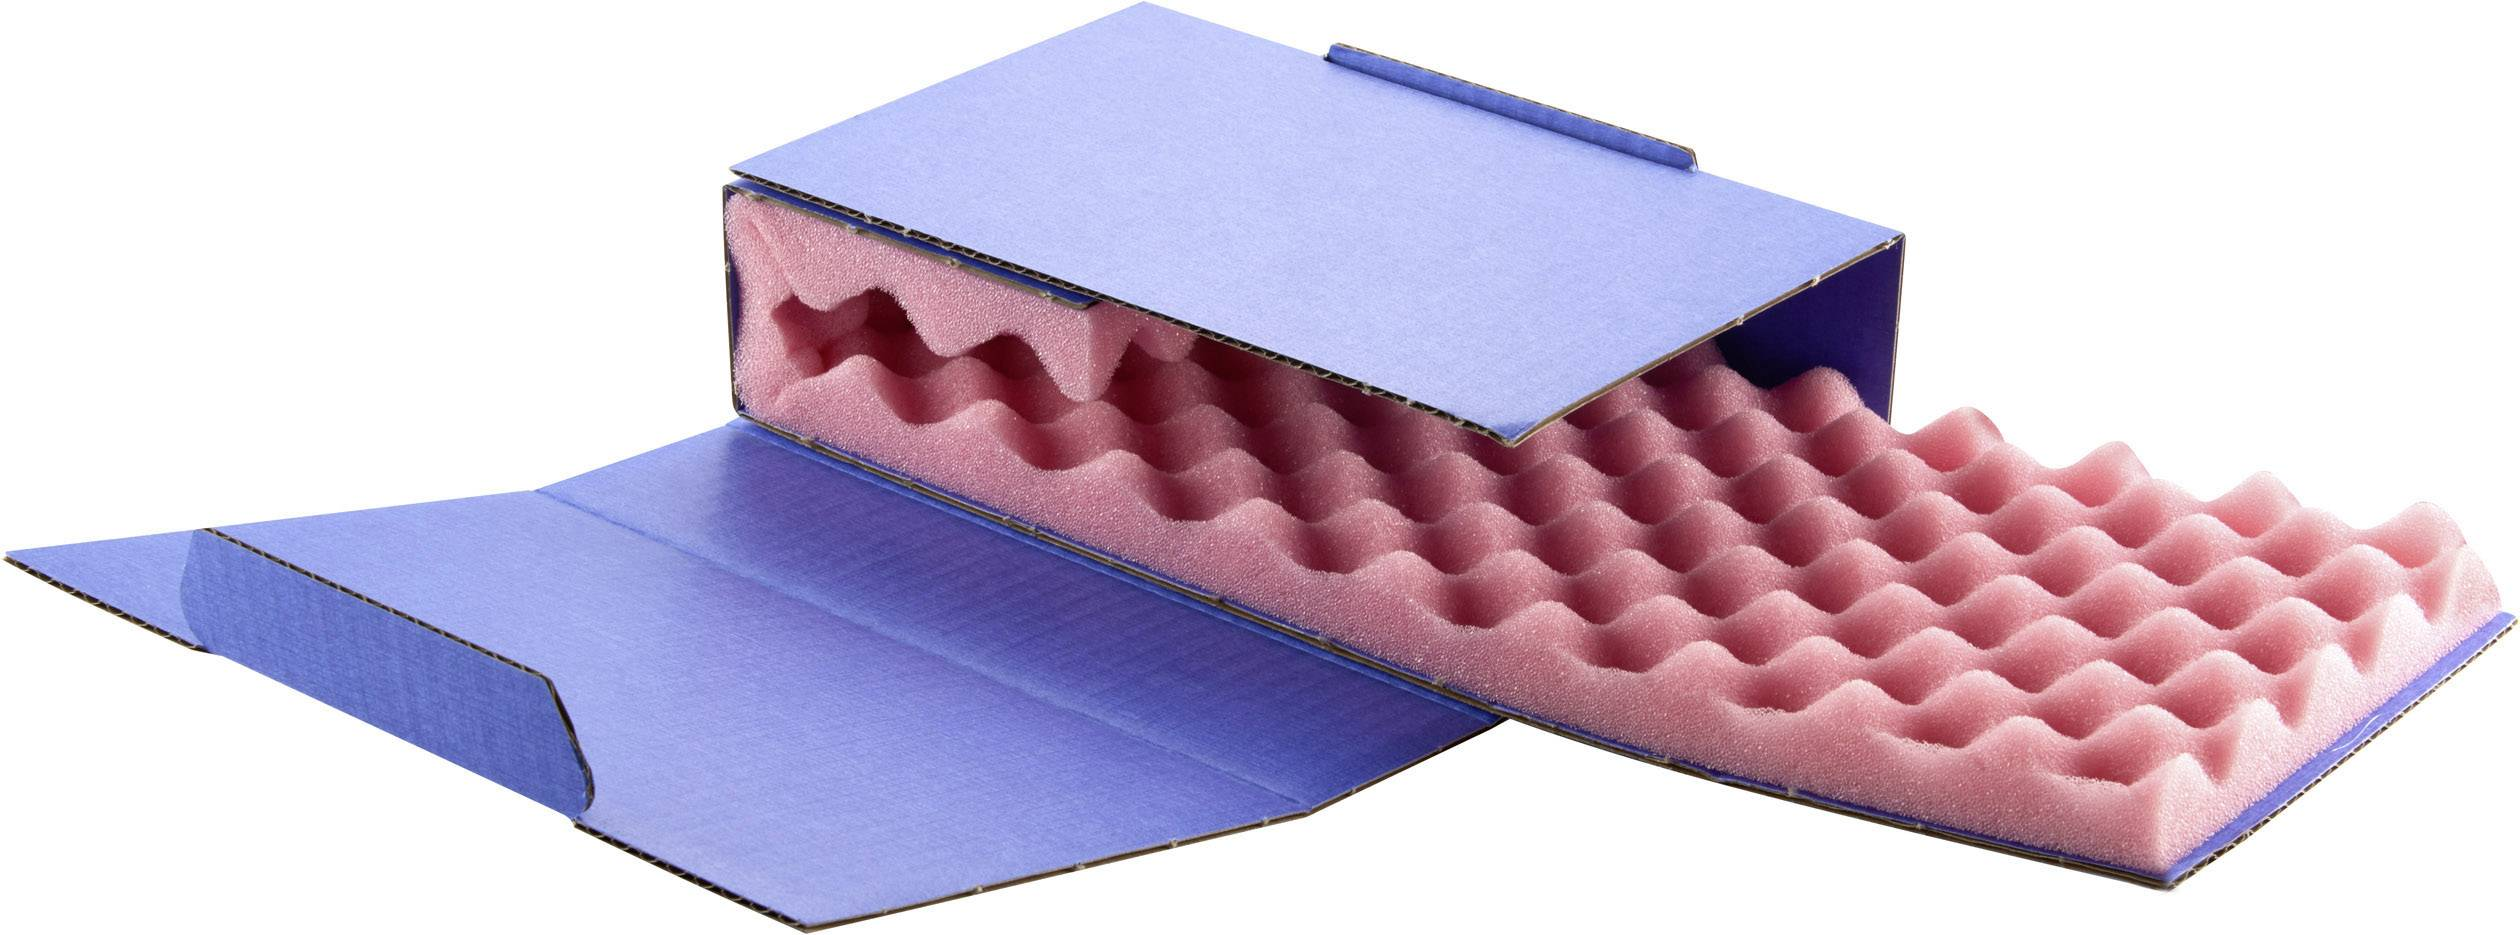 ESD krabica Wolfgang Warmbier 5510.907, (d x š x v) 200 x 140 x 50 mm, modrá